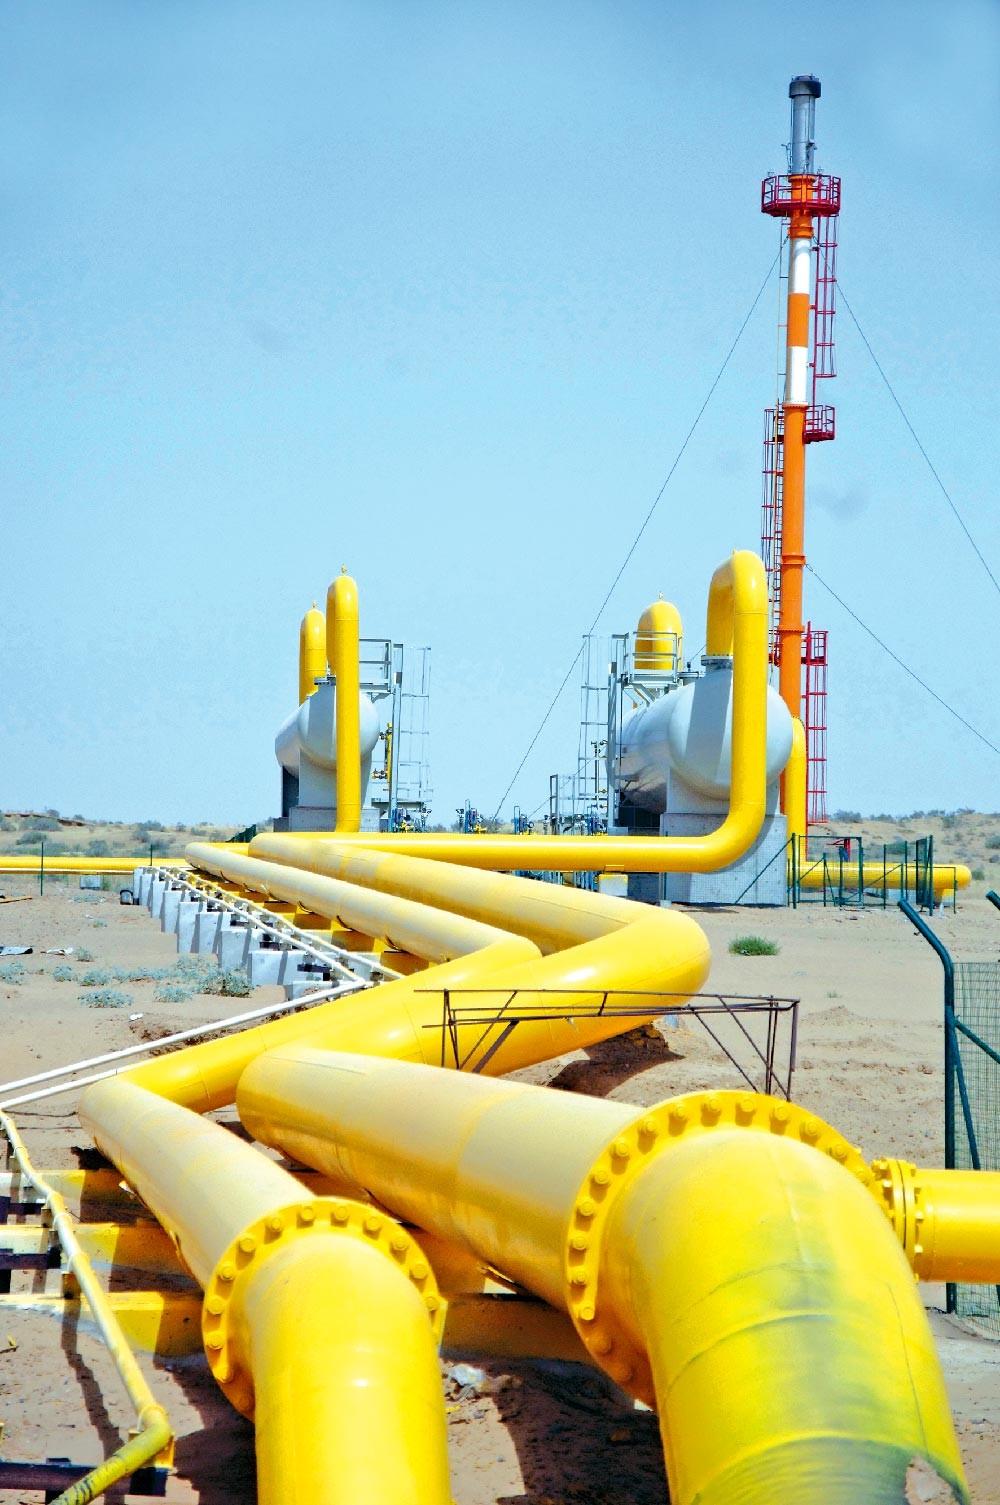 https://www.oilgas.gov.tm/storage/posts/2581/original-160e4171291c47.jpeg